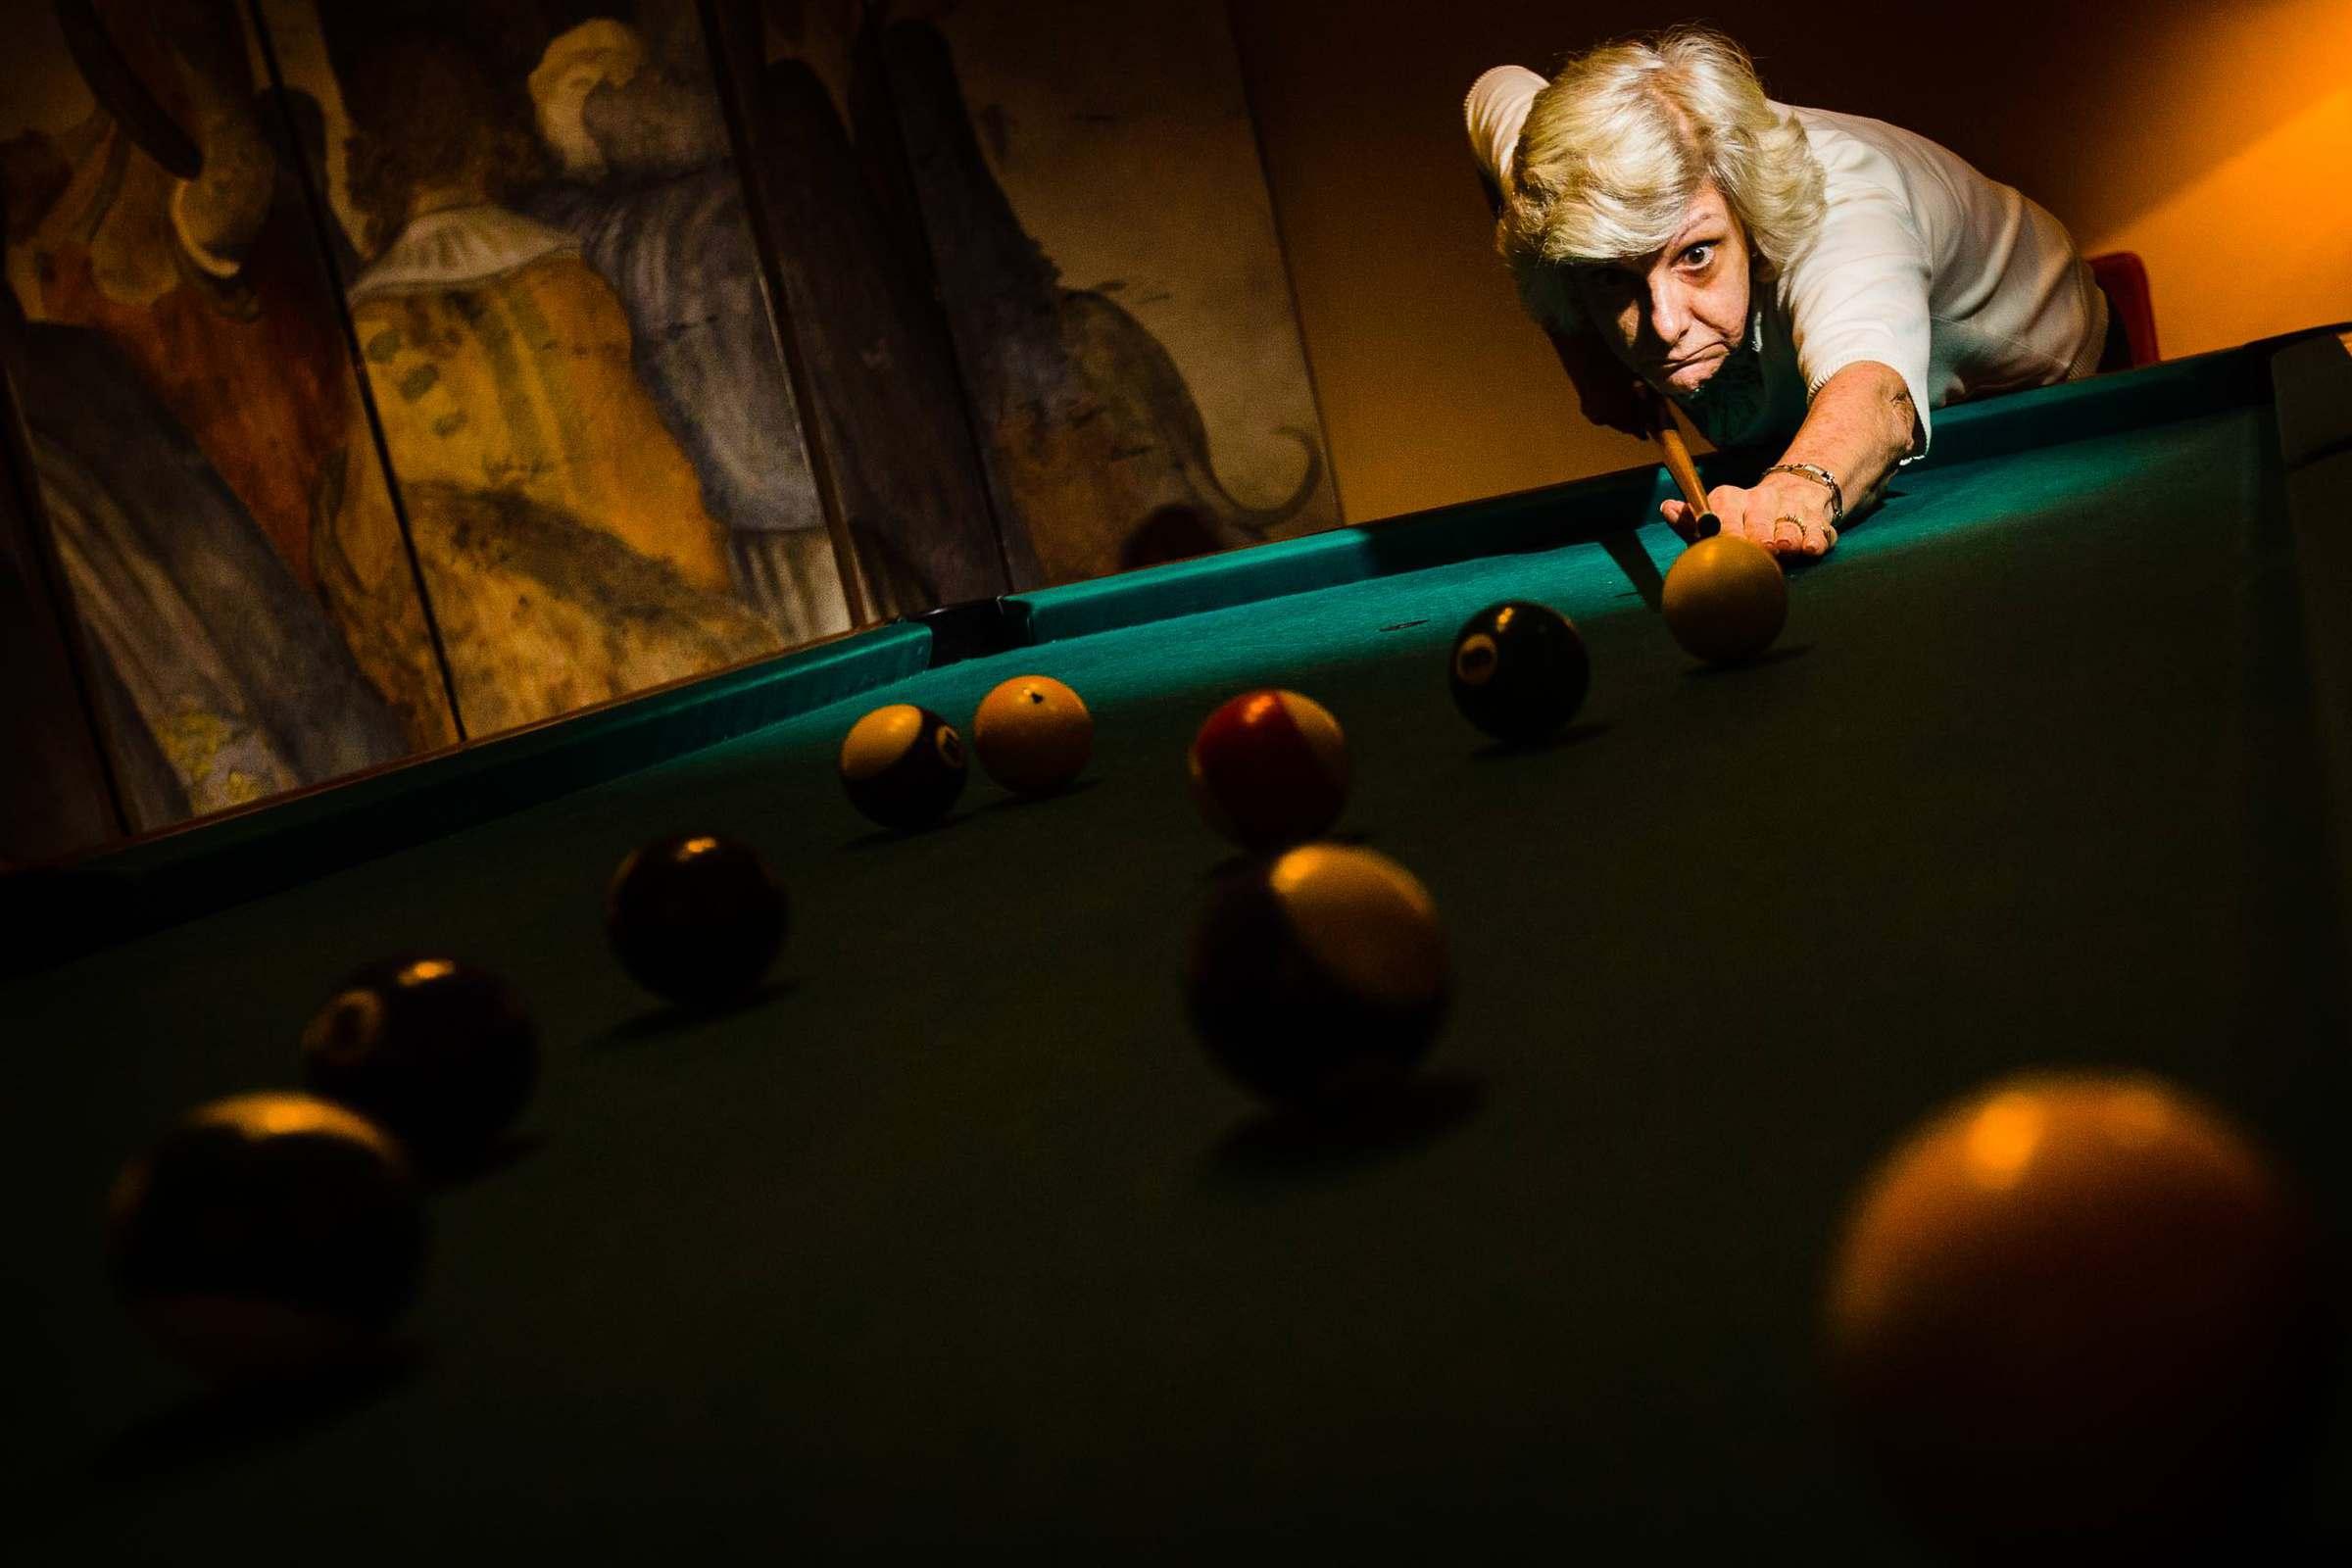 Mother enjoying playing pool during a Villa Tre Grazie wedding celebration near Todi, Italy.